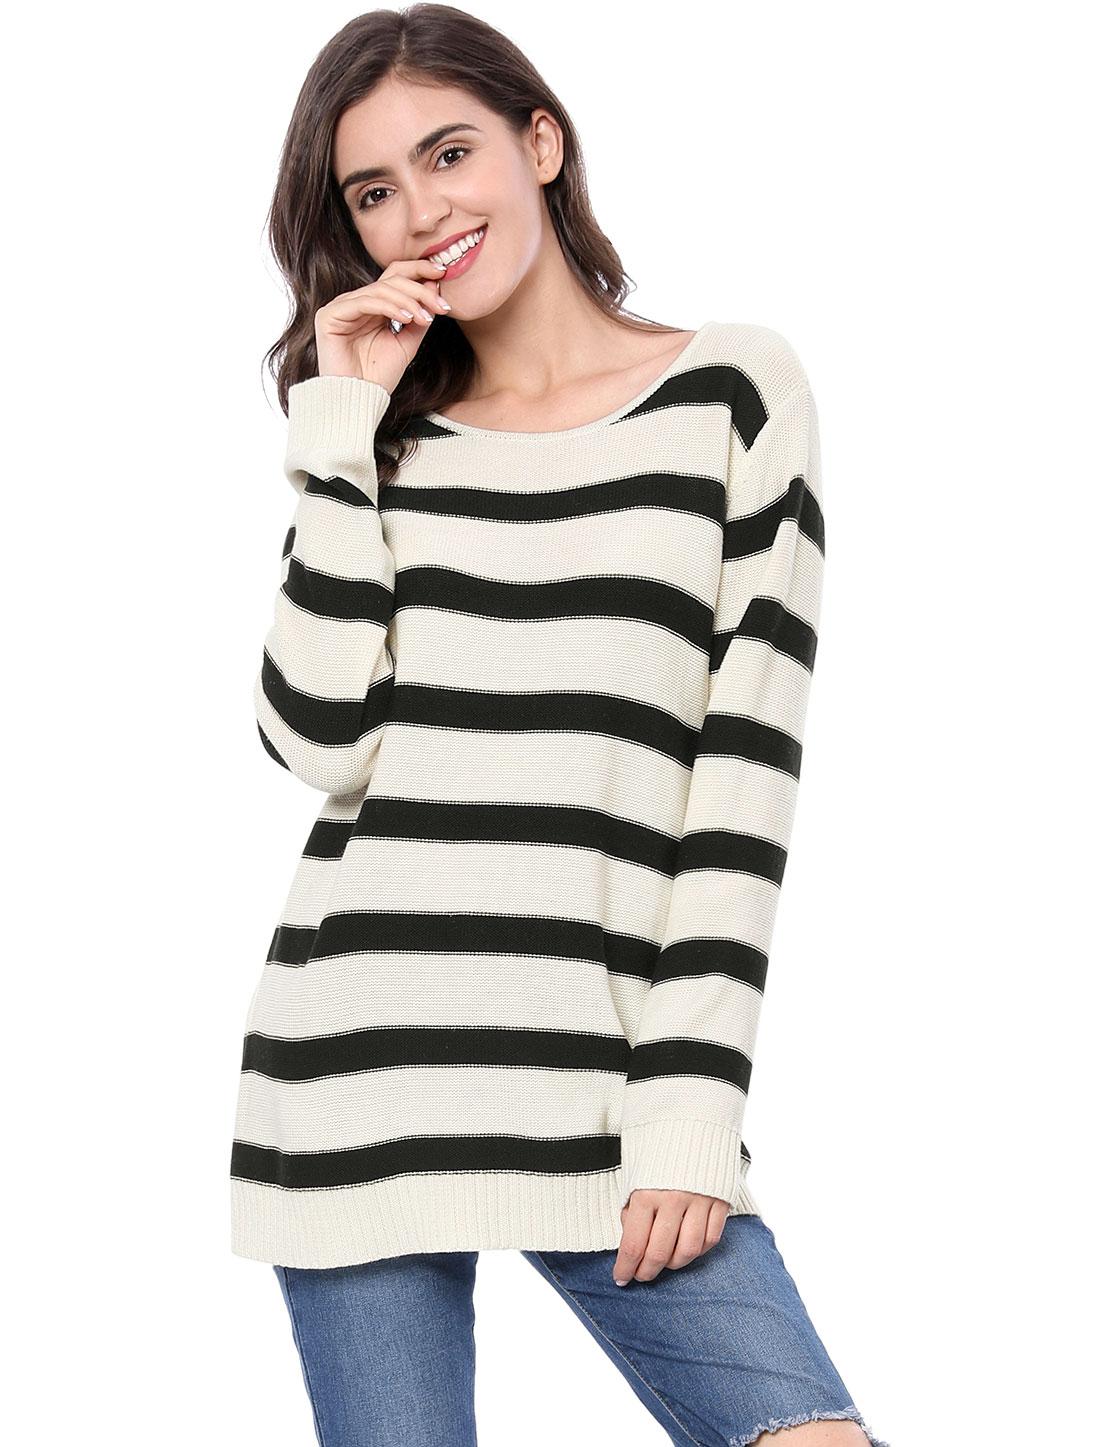 Allegra K Women Long Sleeves Drop Shoulder Loose Striped Sweater White XL